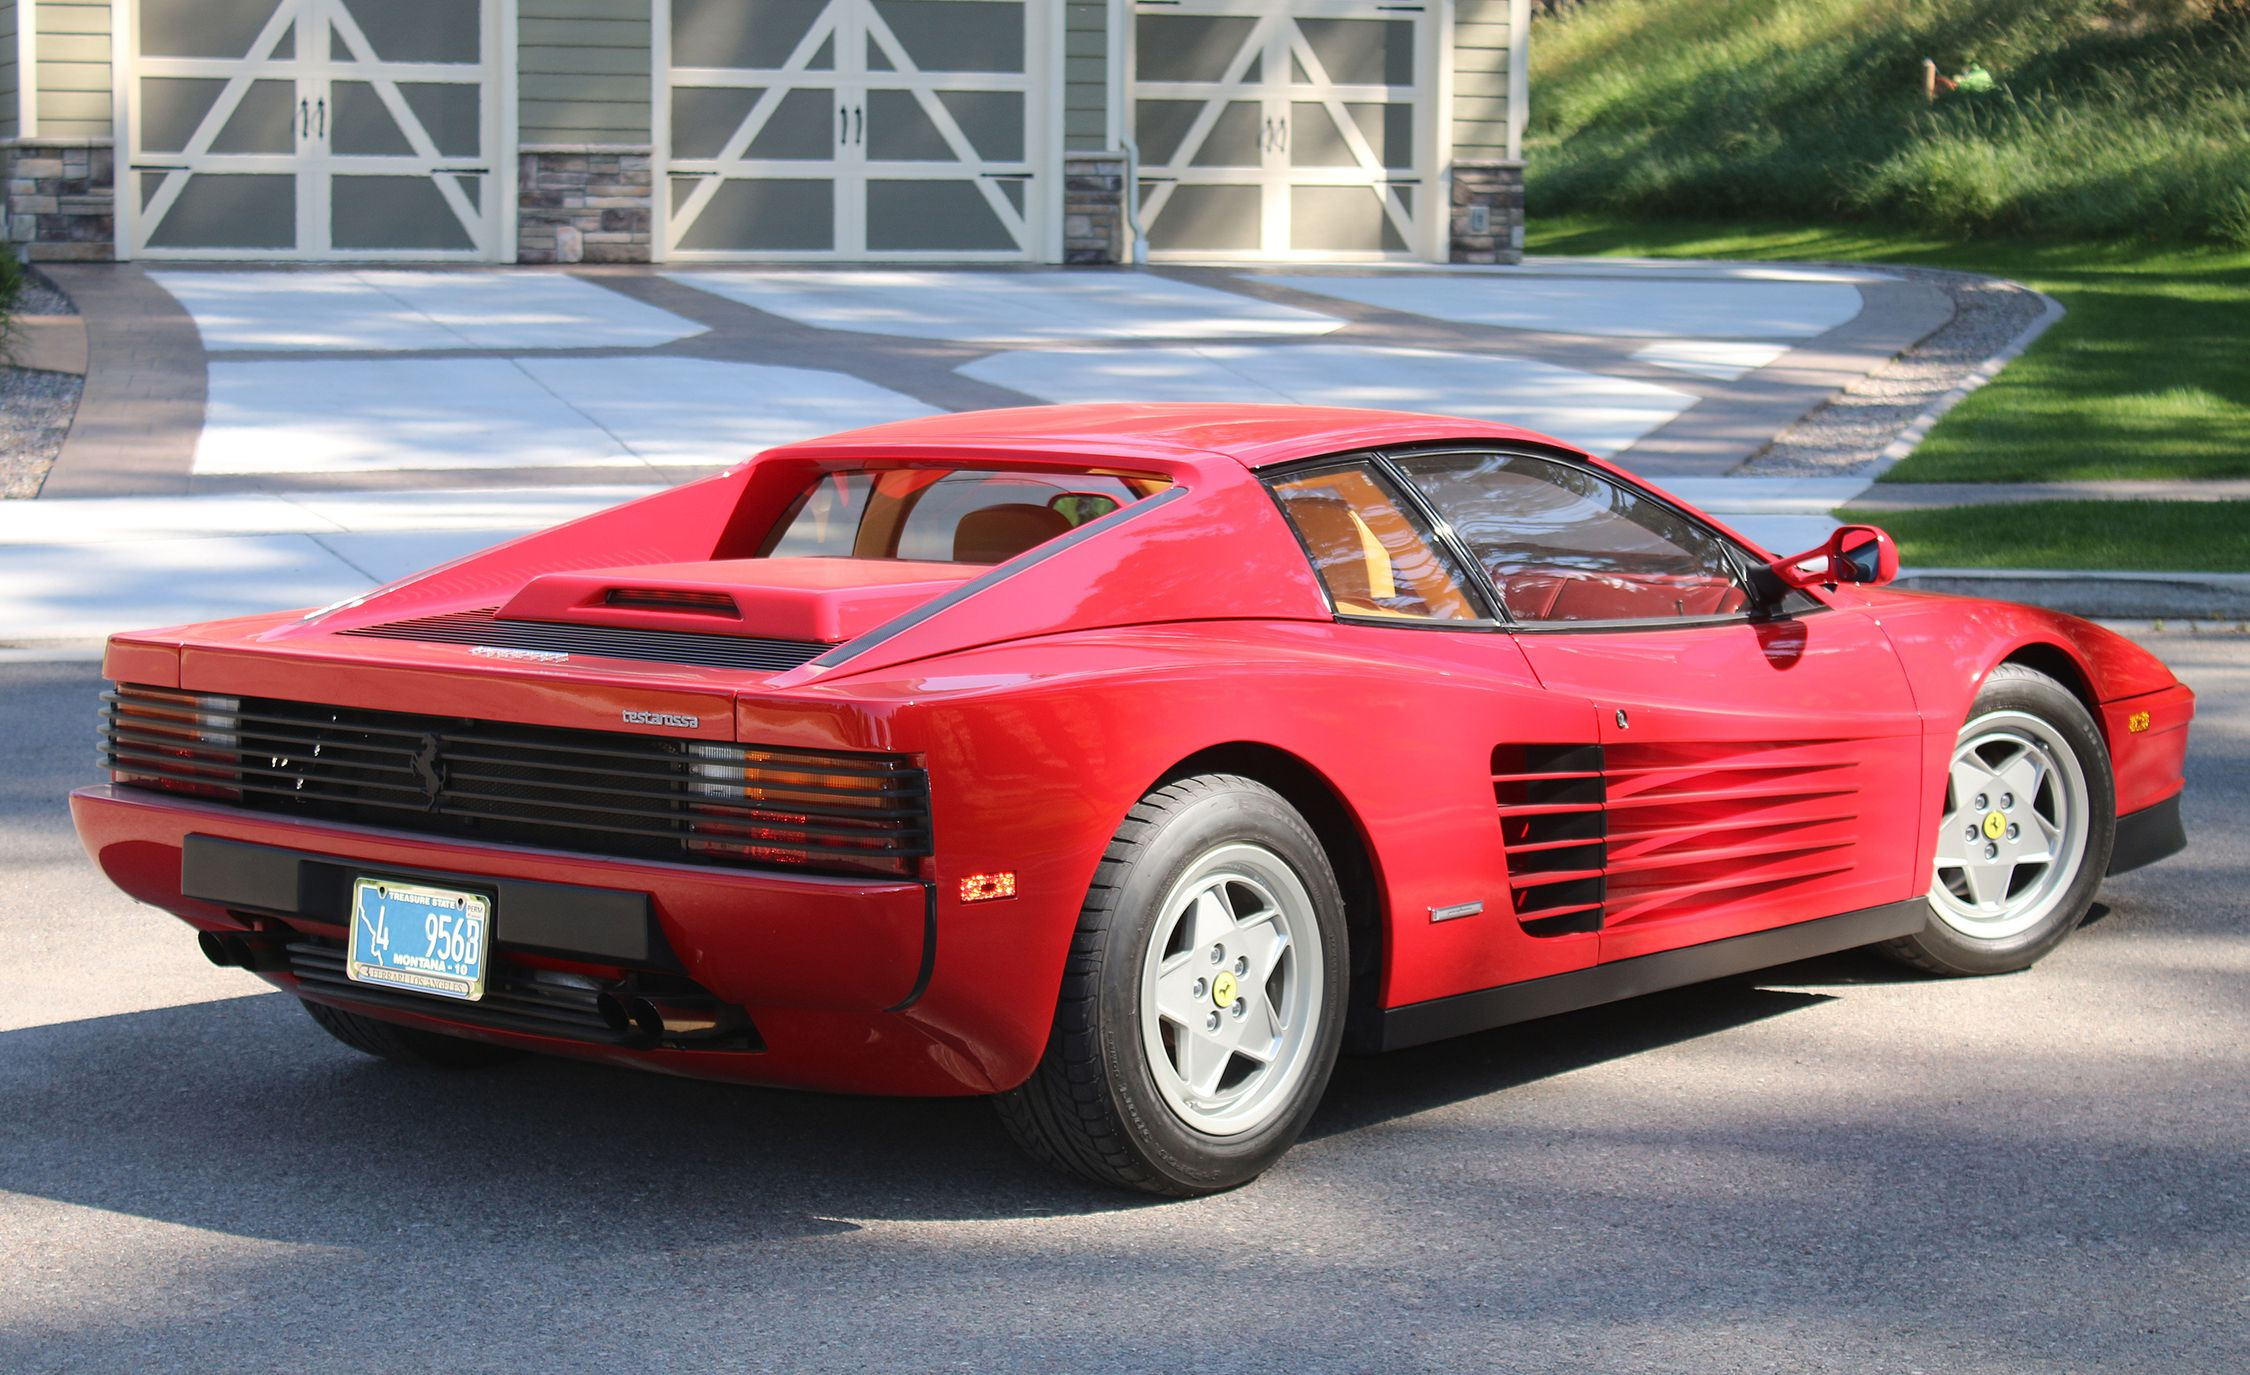 I Have A Huge Soft Spot For This 1990 Ferrari Testarossa